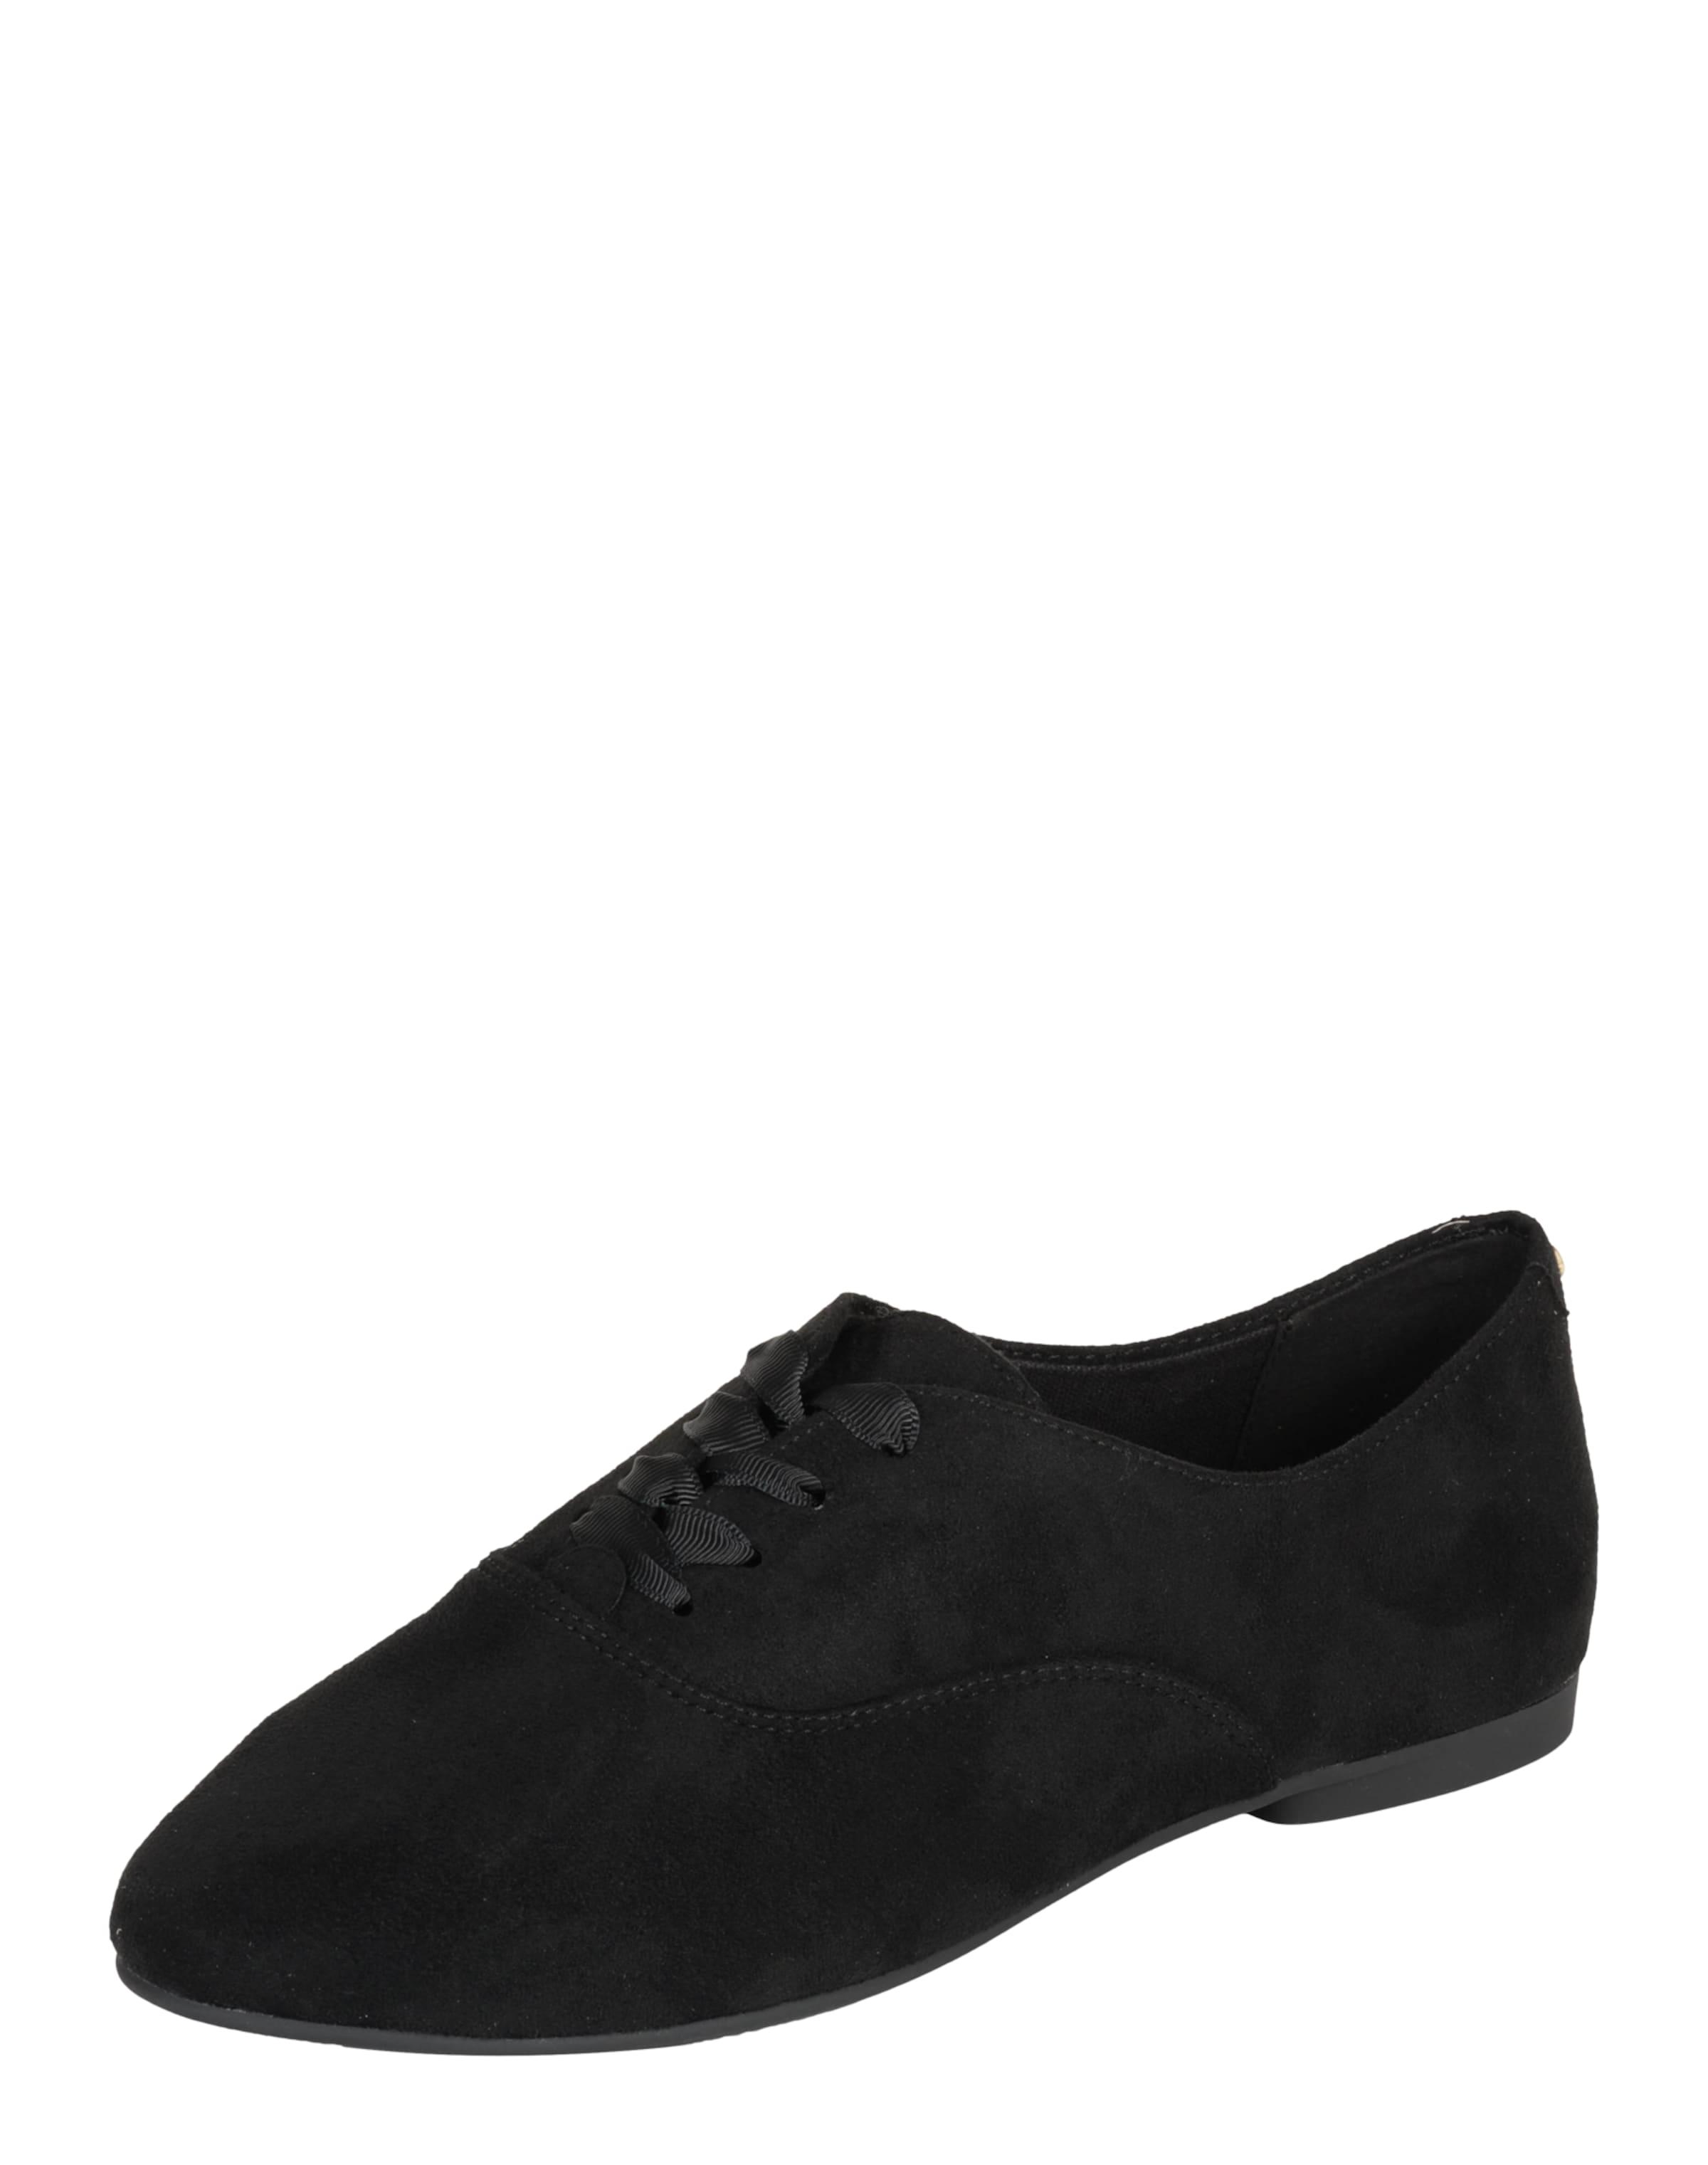 Haltbare Mode billige Schuhe ALDO ALDO ALDO | Schnürschuh 'Leganiel' Schuhe Gut getragene Schuhe 64a417